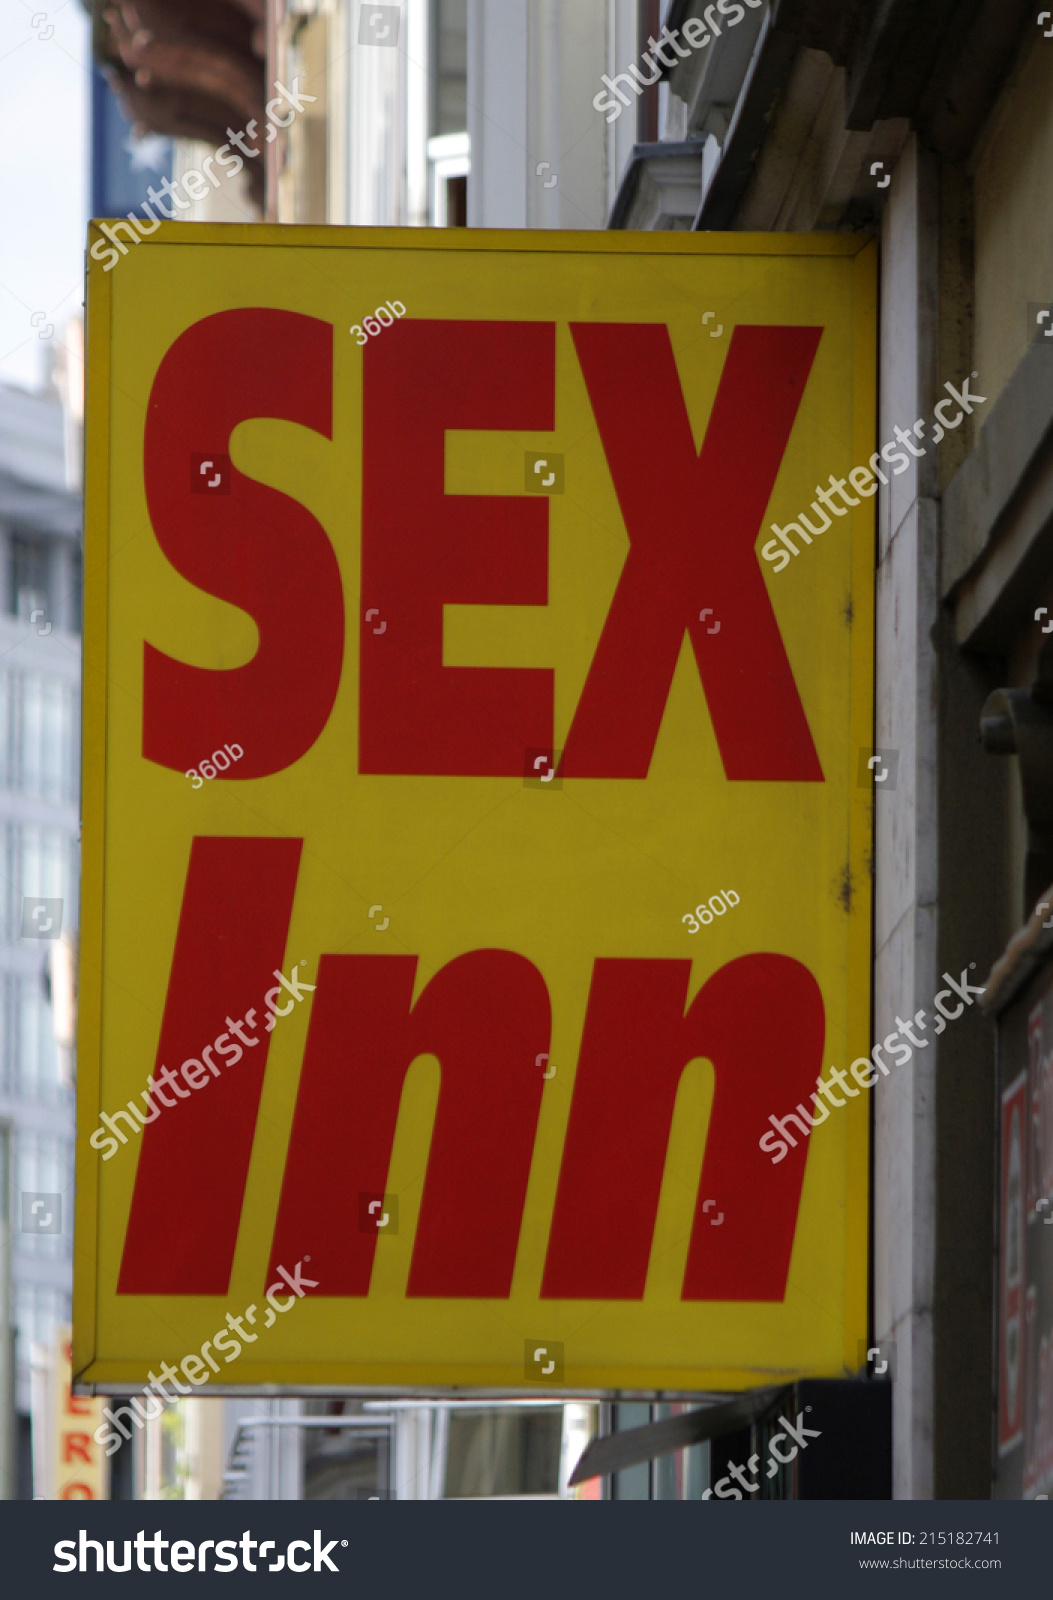 sex frankfurt am main erotikchat for free